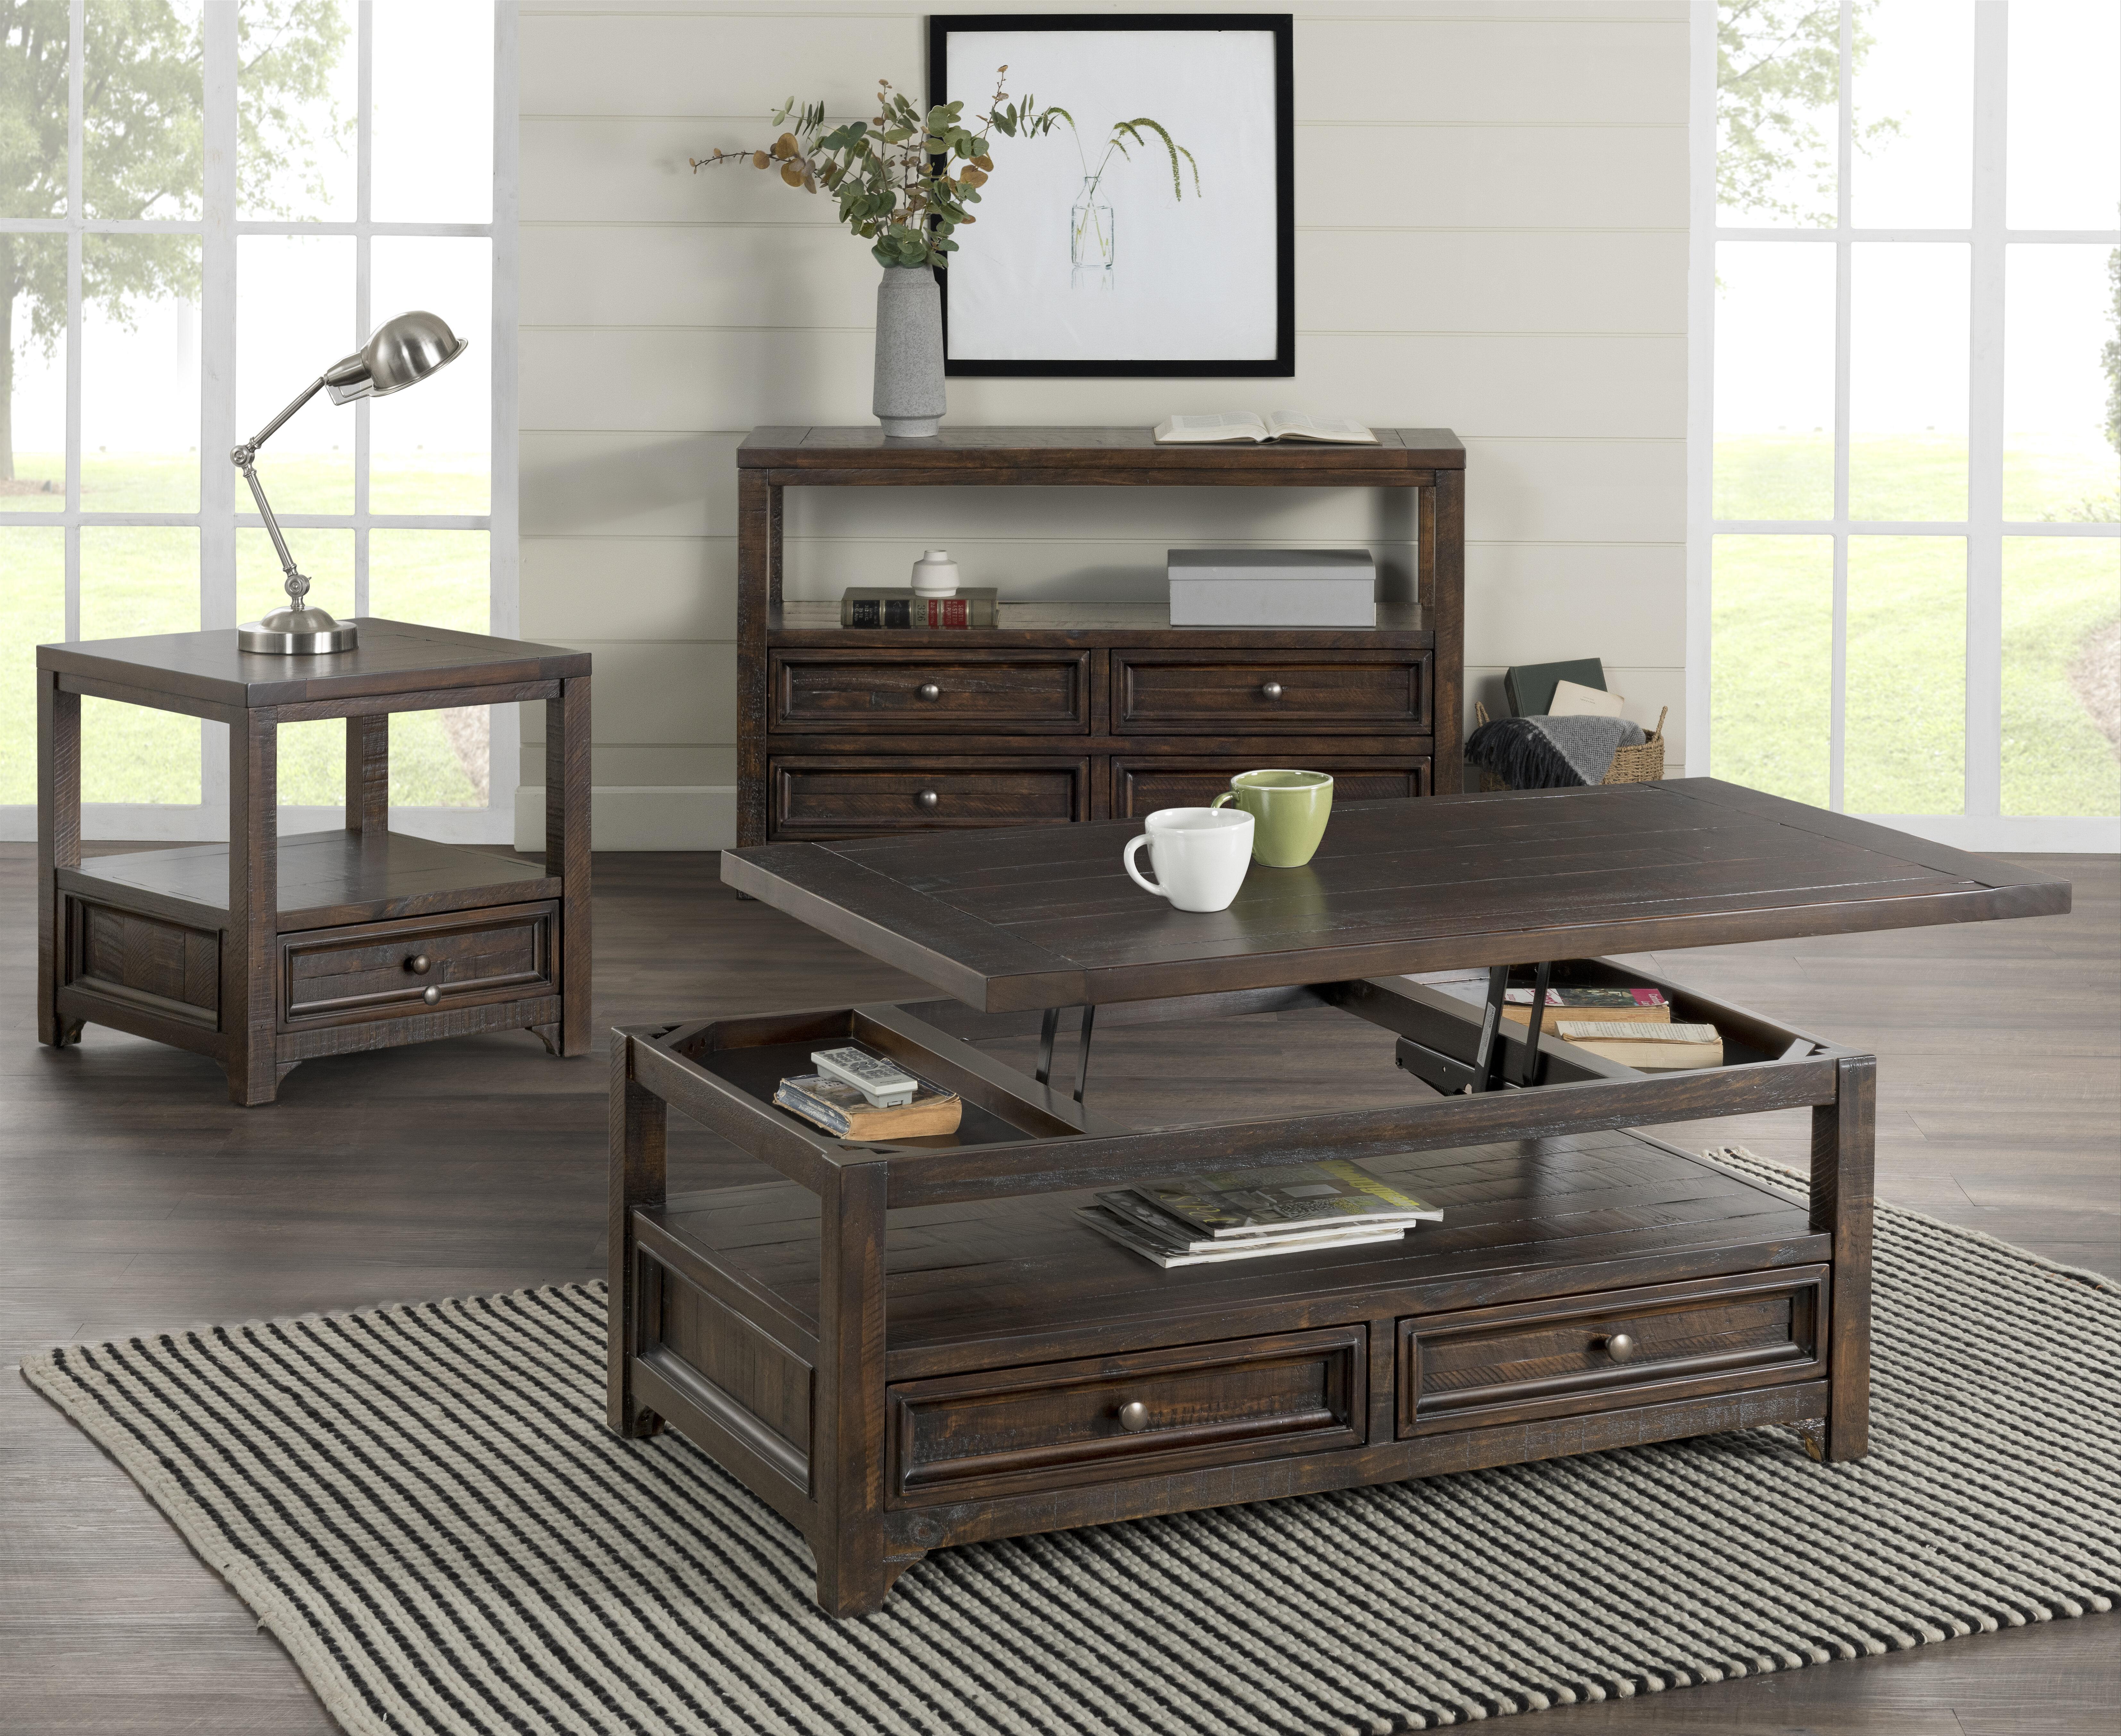 Canora Grey Flynn Configurable 2 Piece Coffee Table Set Reviews Wayfair